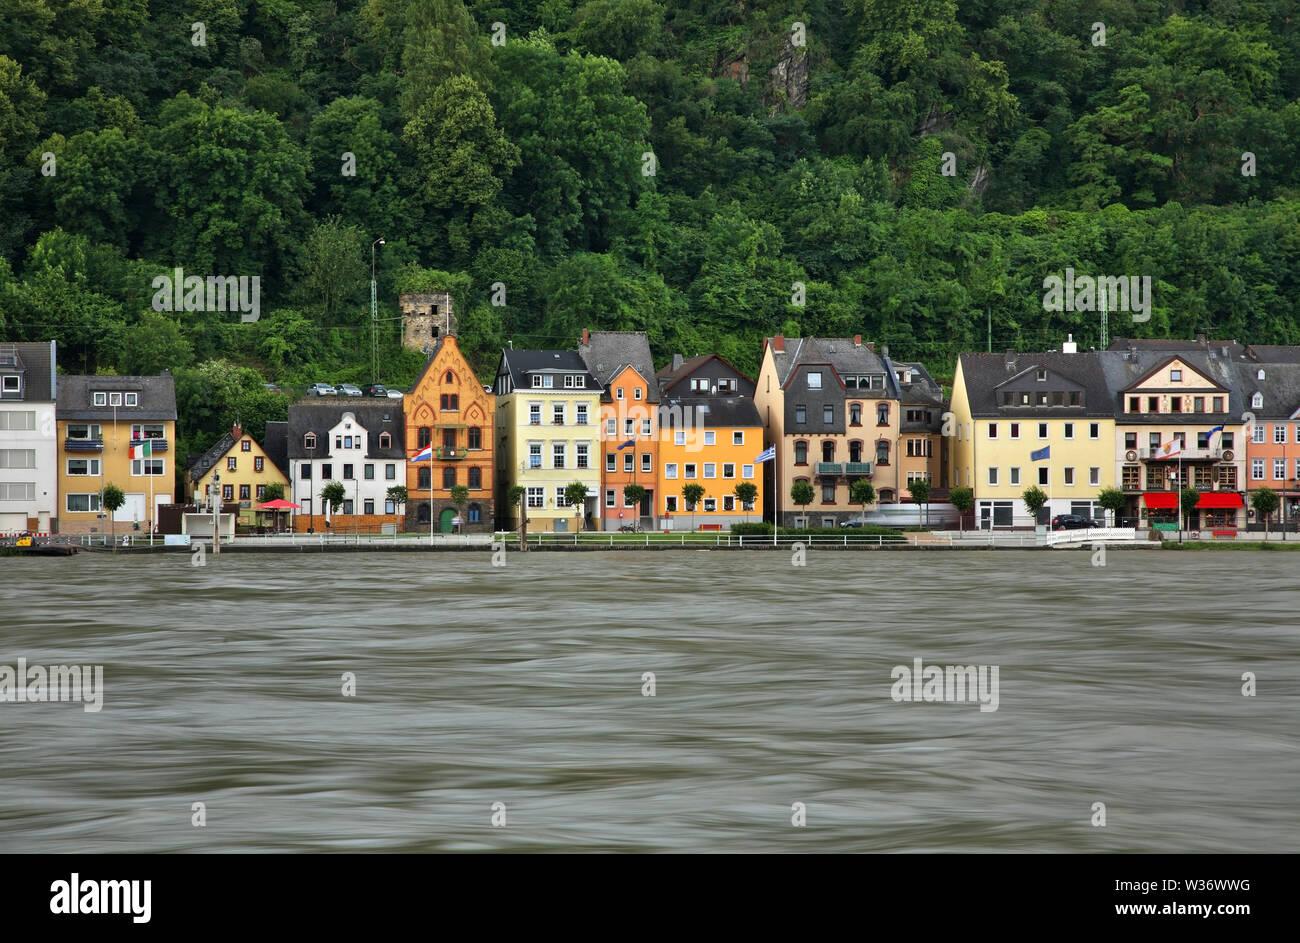 Embankment of Rhine river in Sankt Goar am Rhein. Germany - Stock Image